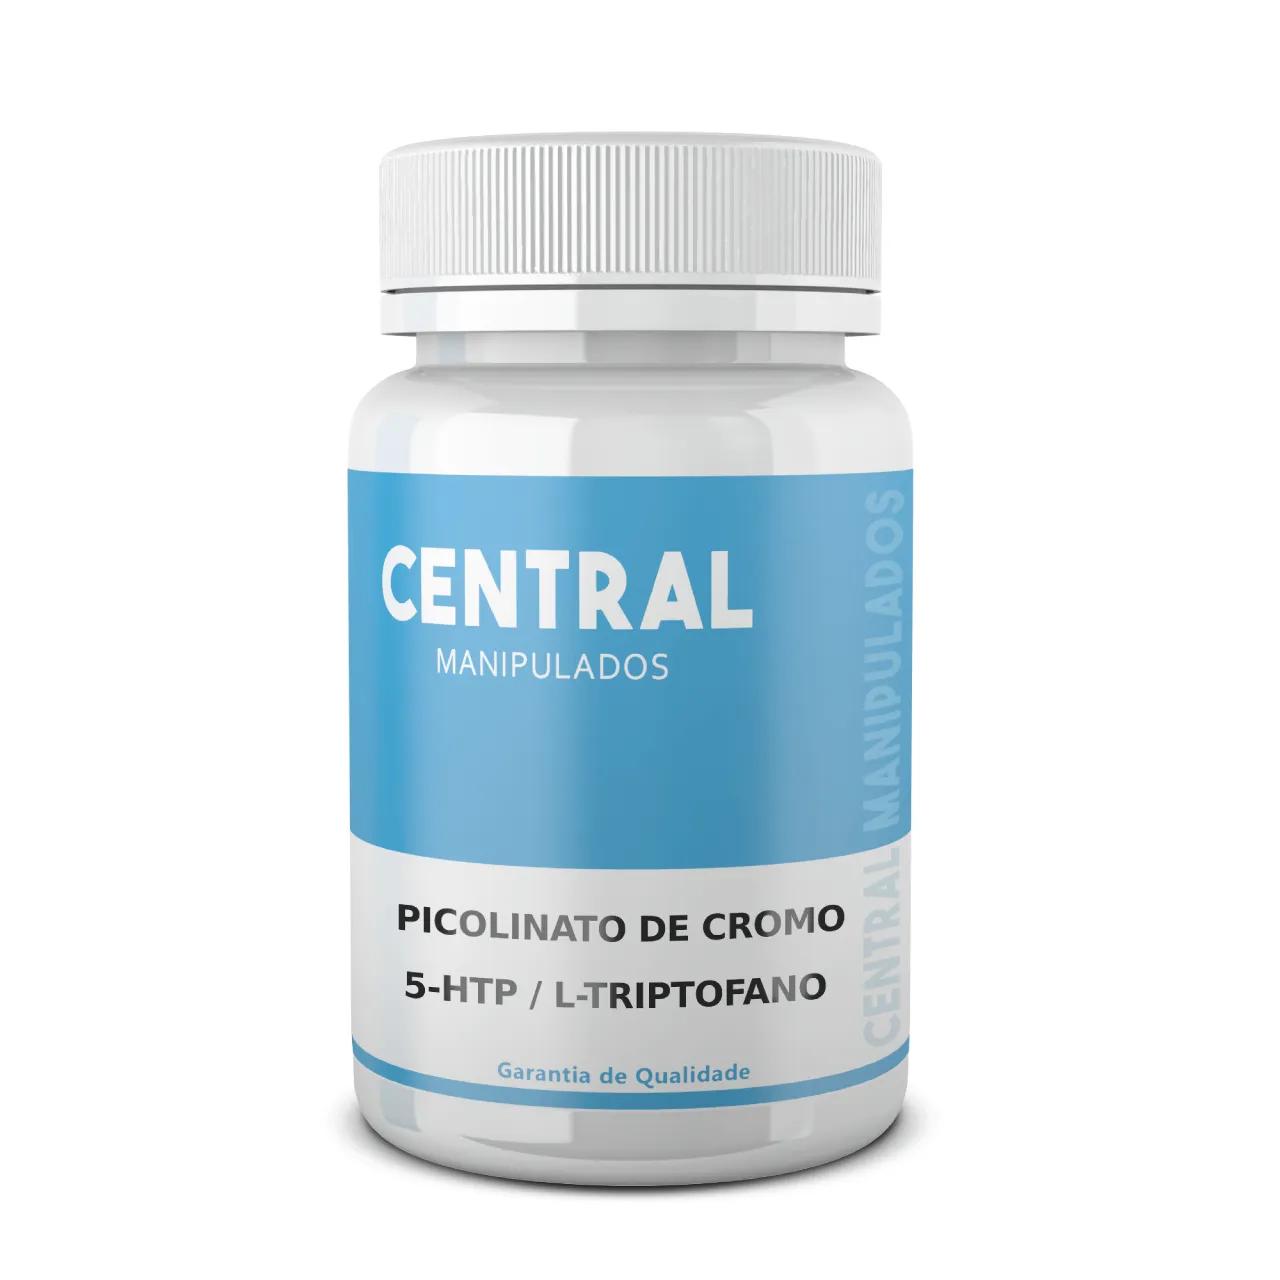 Picolinato de cromo 350mcg + 5-HTP 50mg +  L-Triptofano 300mg - 180 cápsulas - Composto para Ansiedade